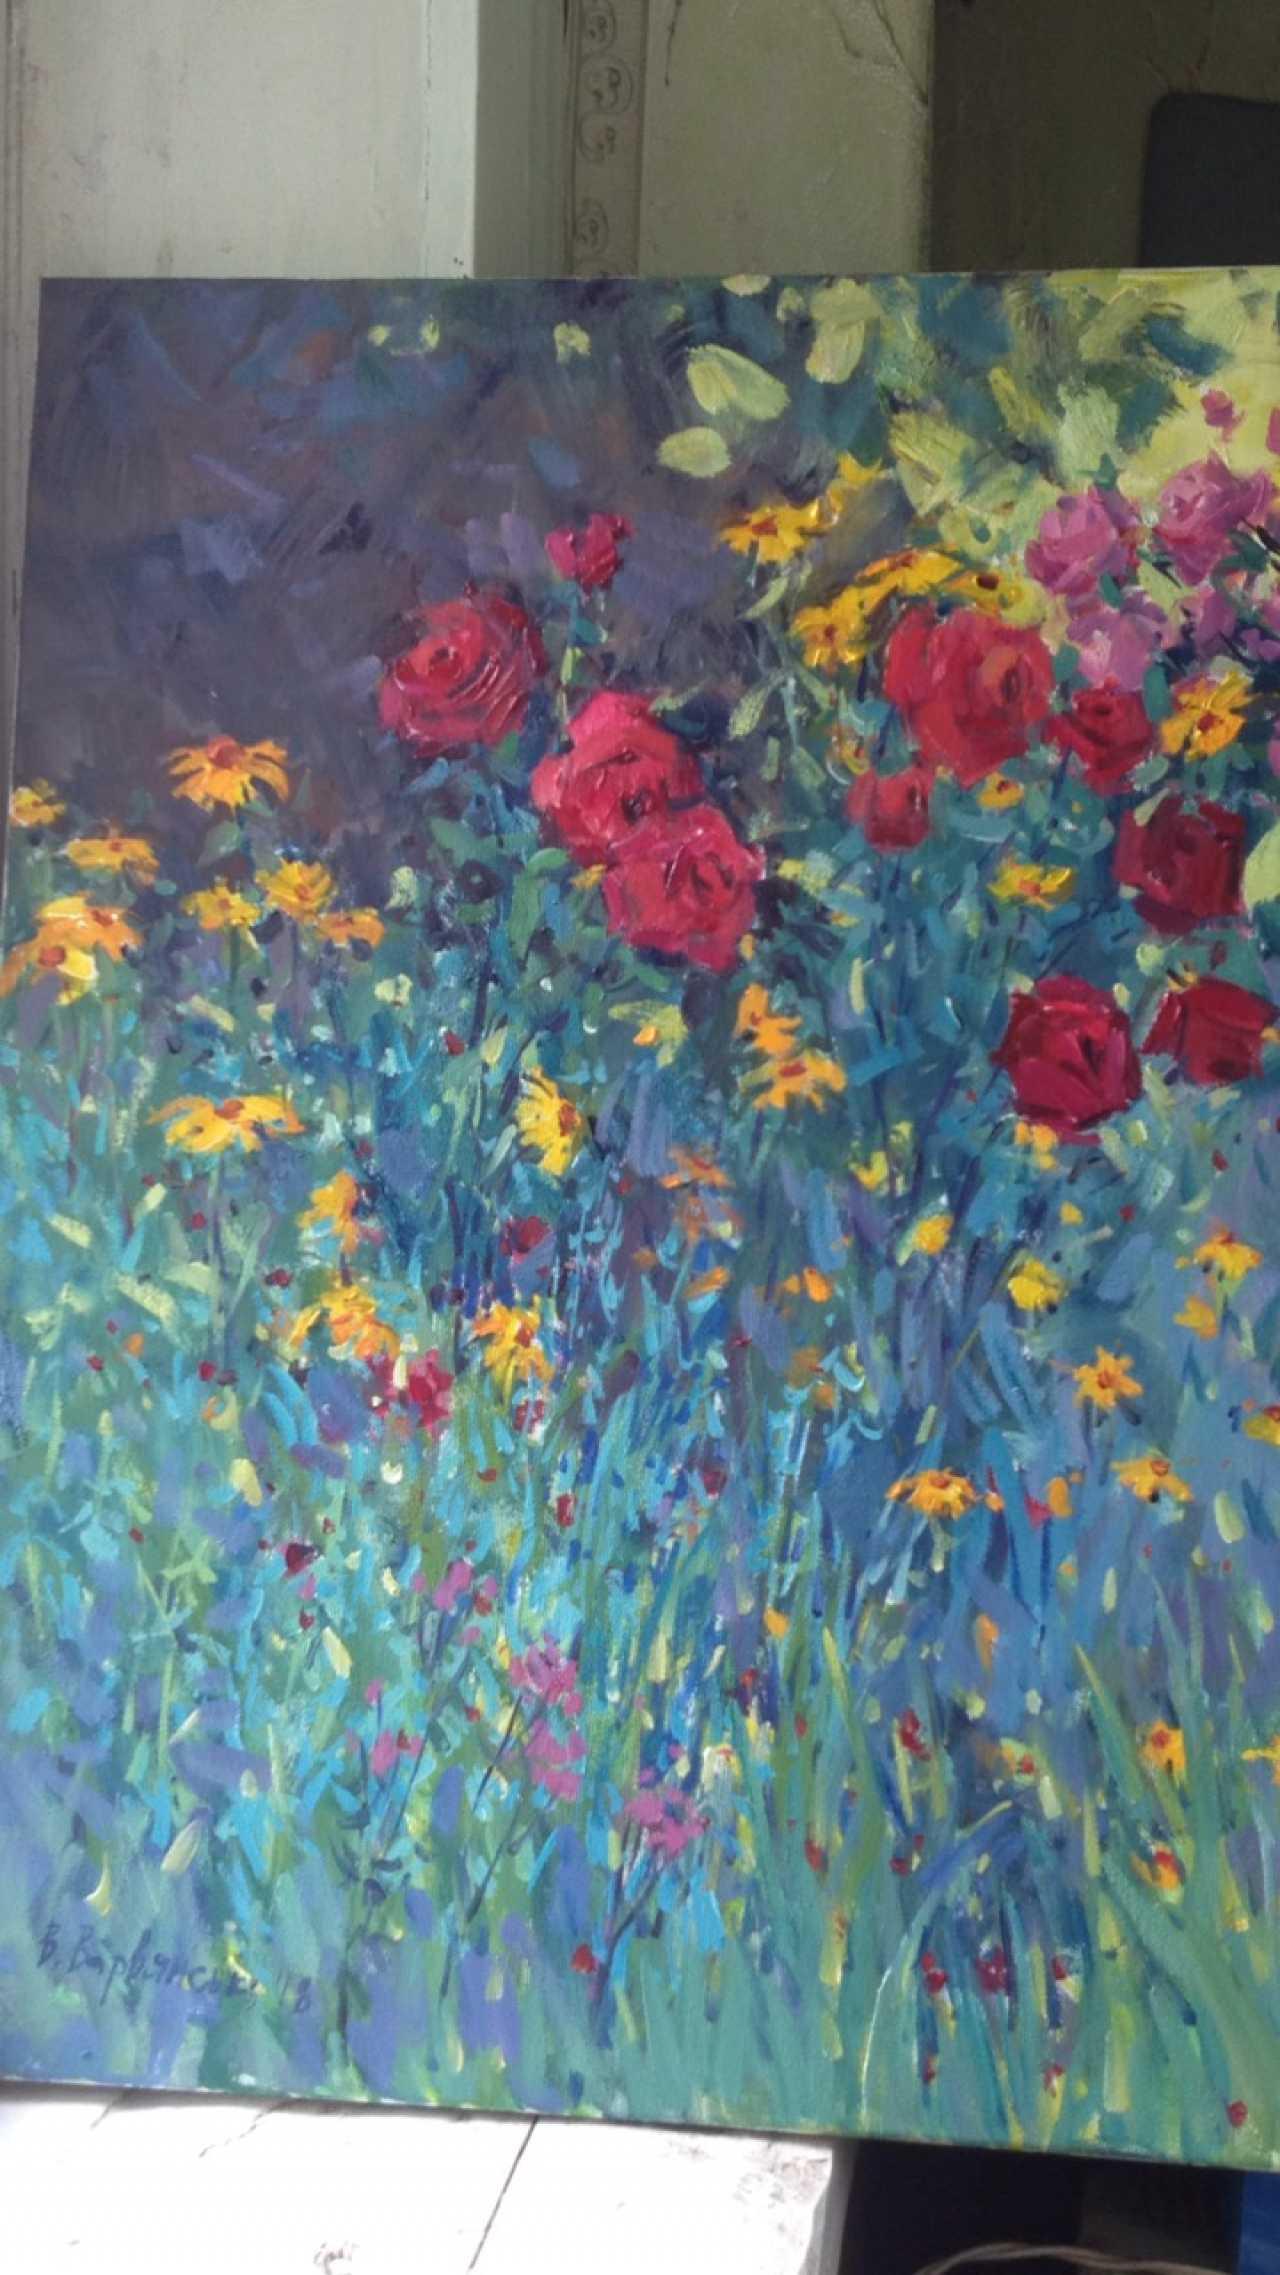 Image De Parterre De Fleurs vira varvianska. mamina un parterre de fleurs